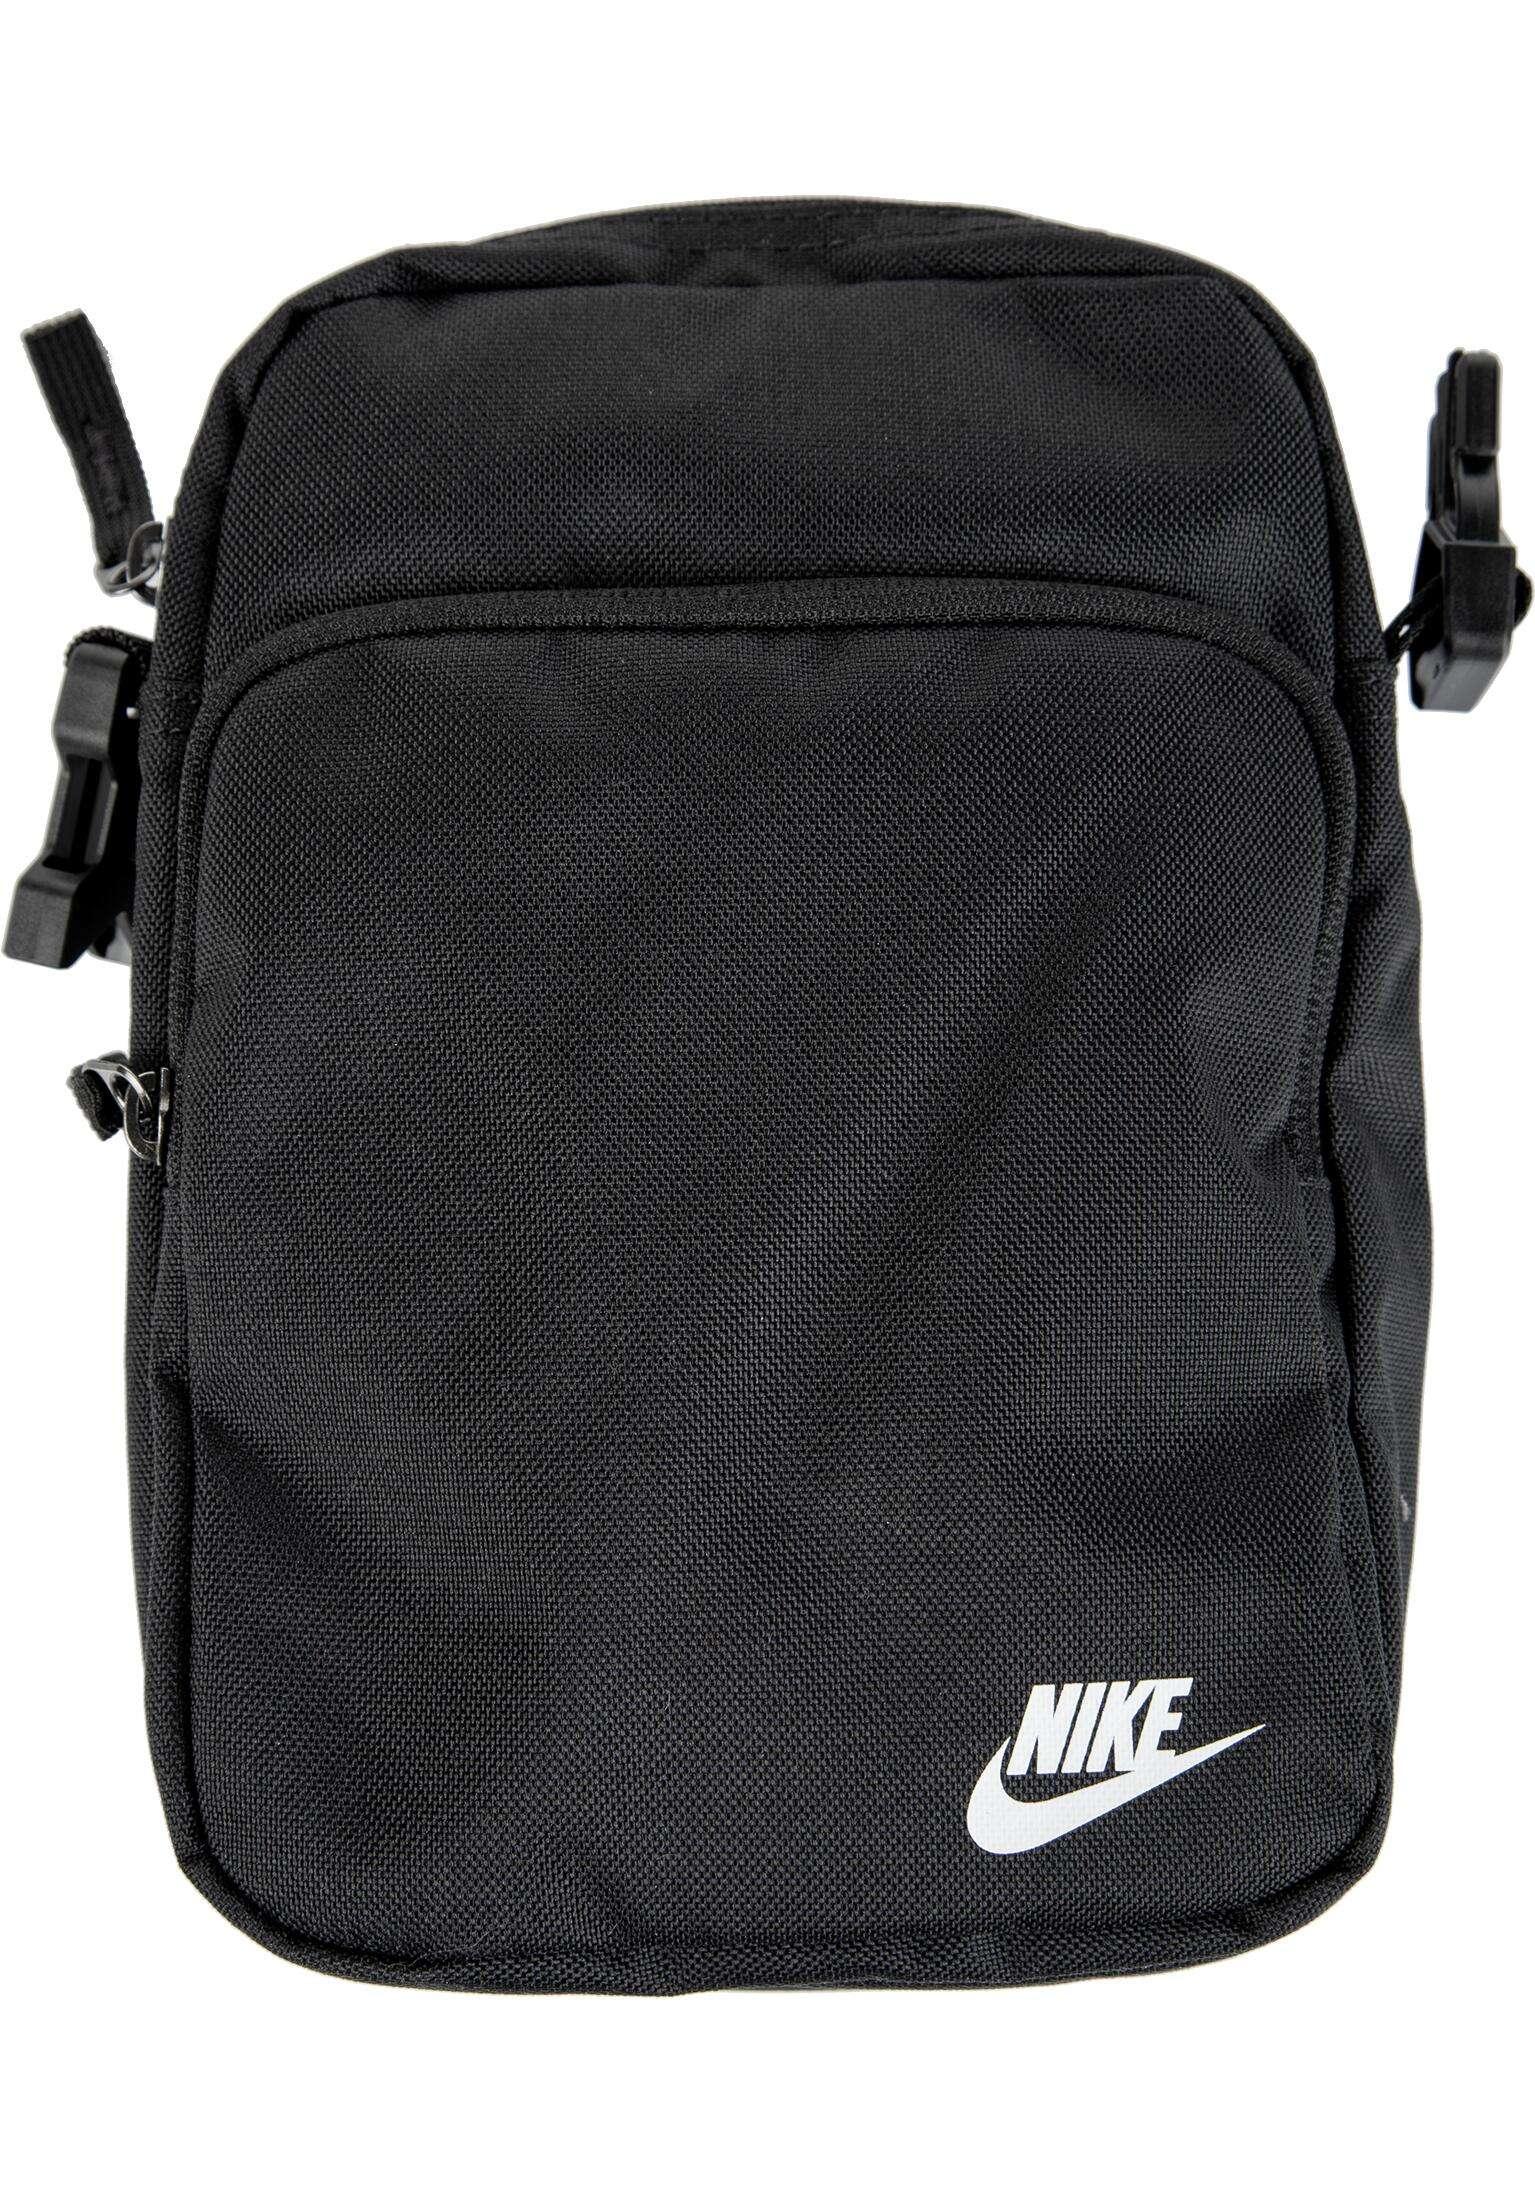 Nike SB Heritage Smit 2.0